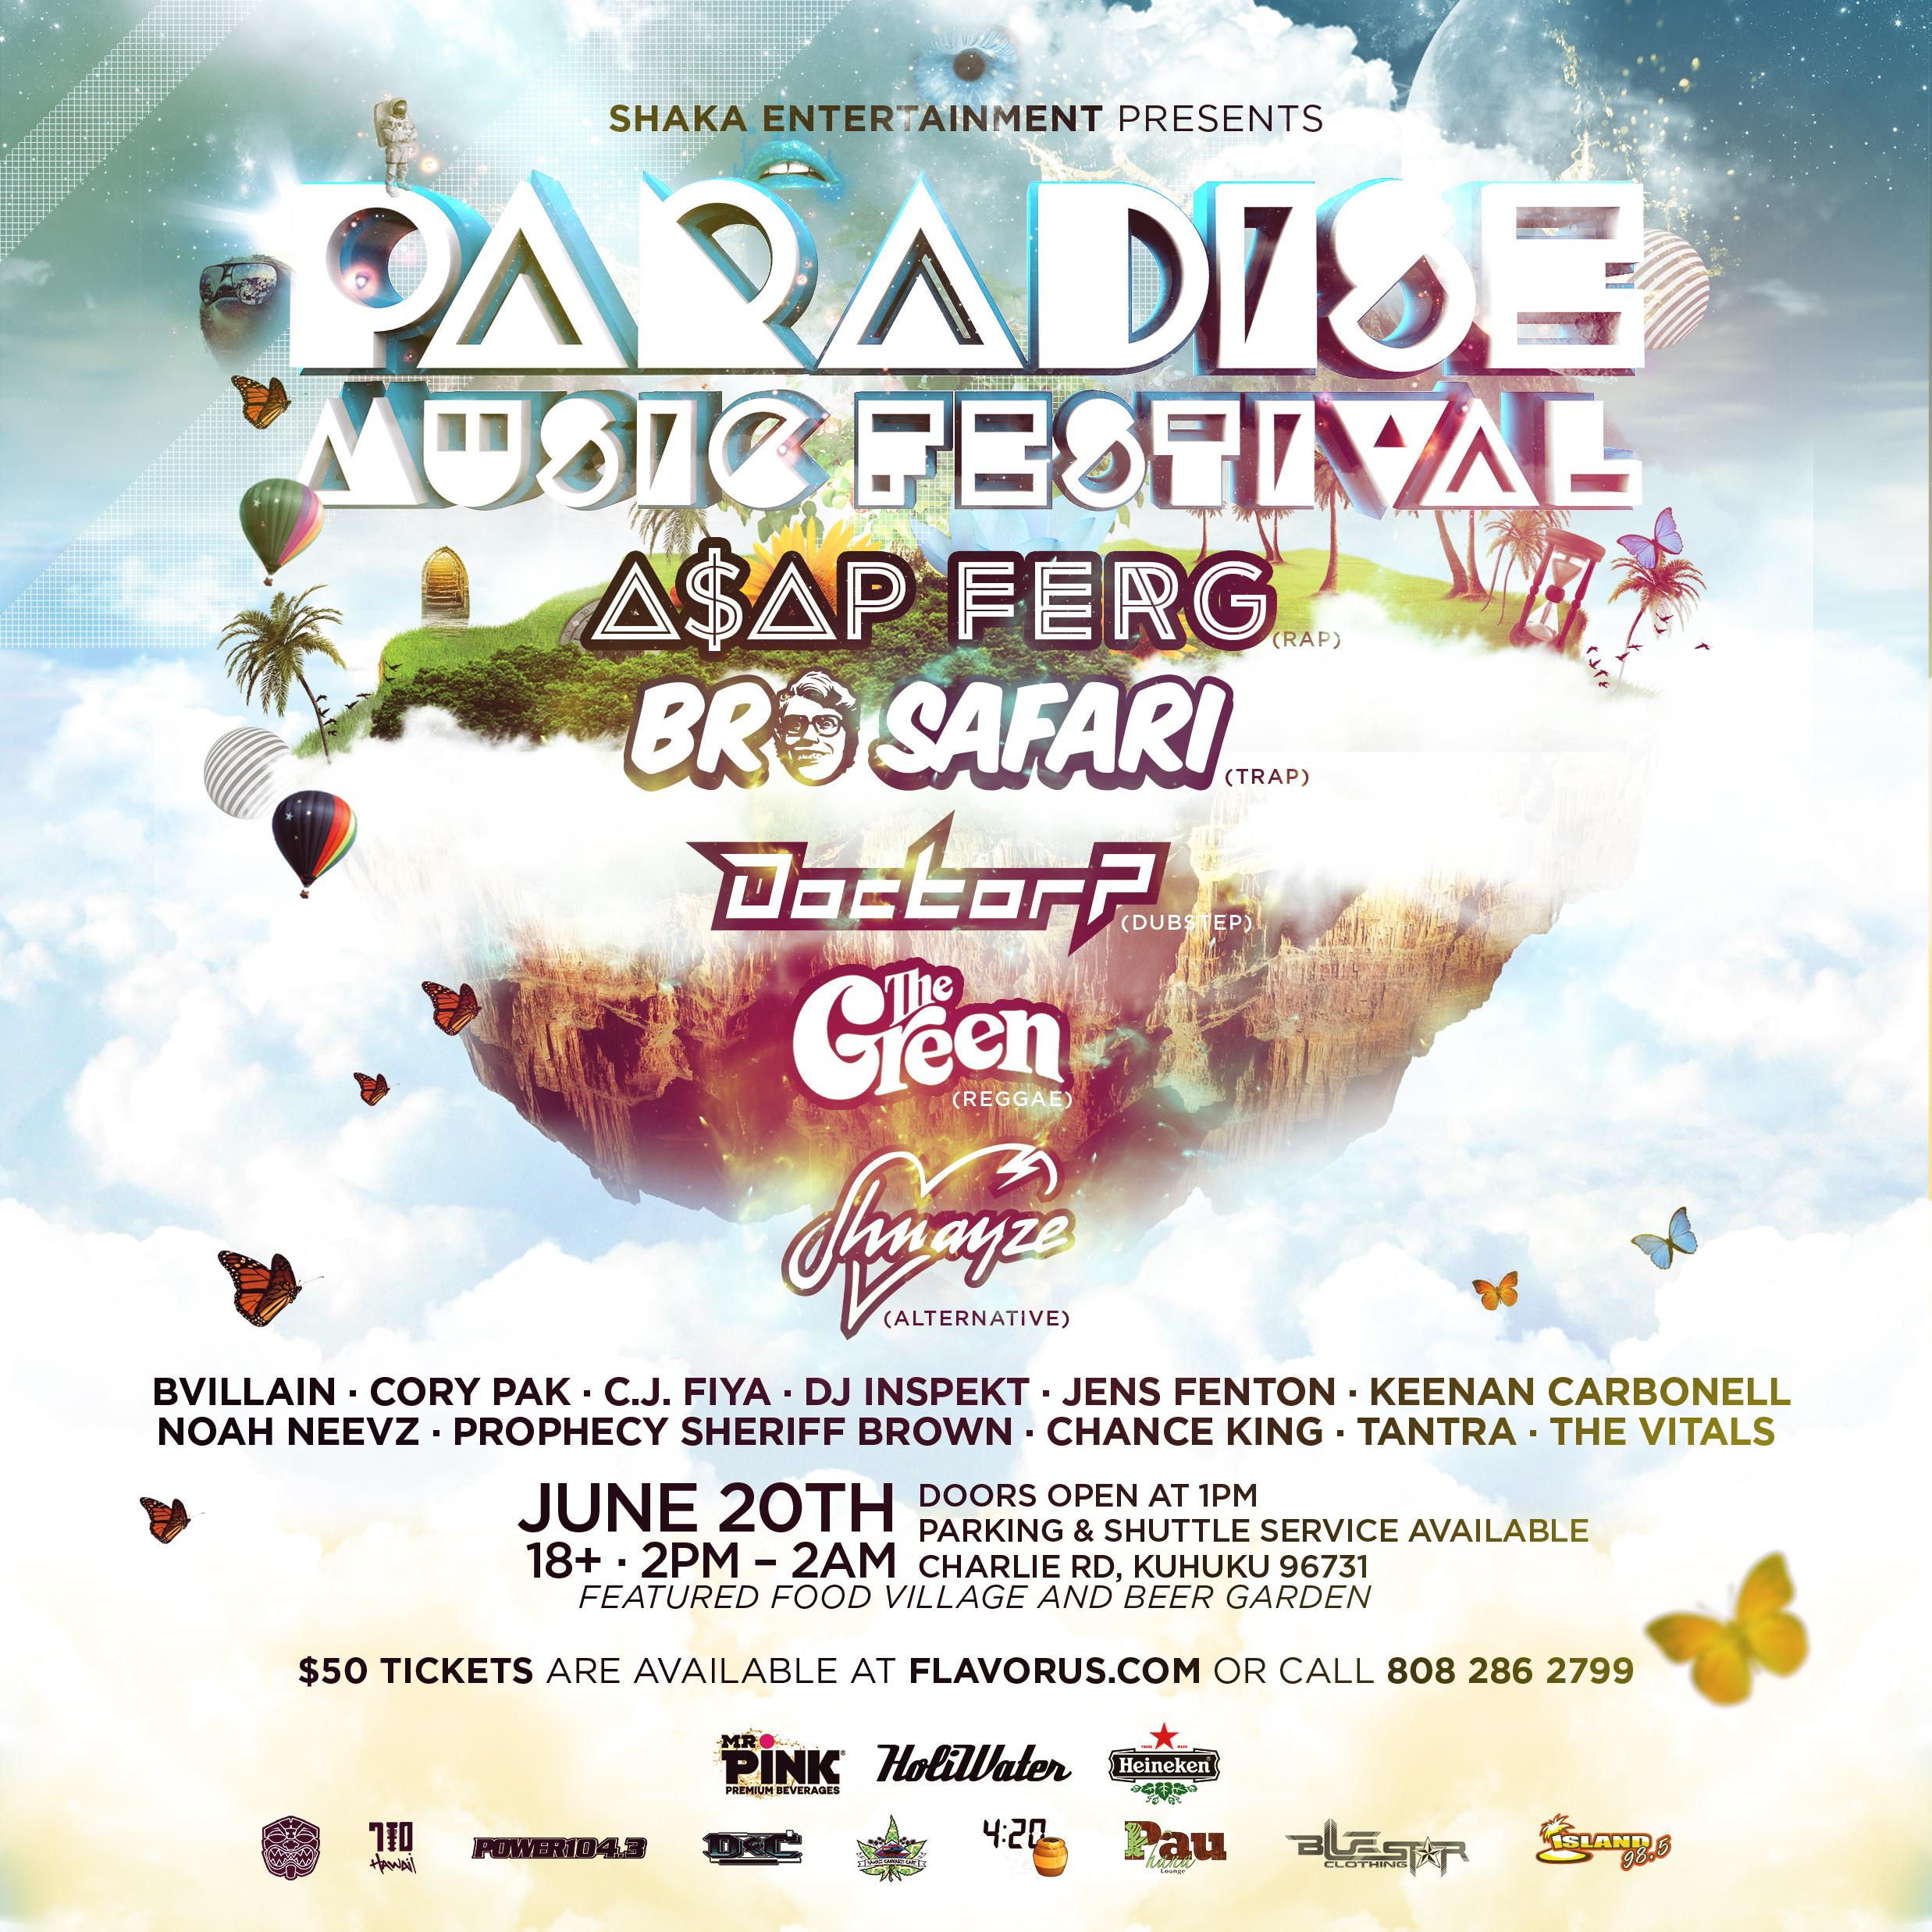 Paradise Music Festival Tickets 06/20/15